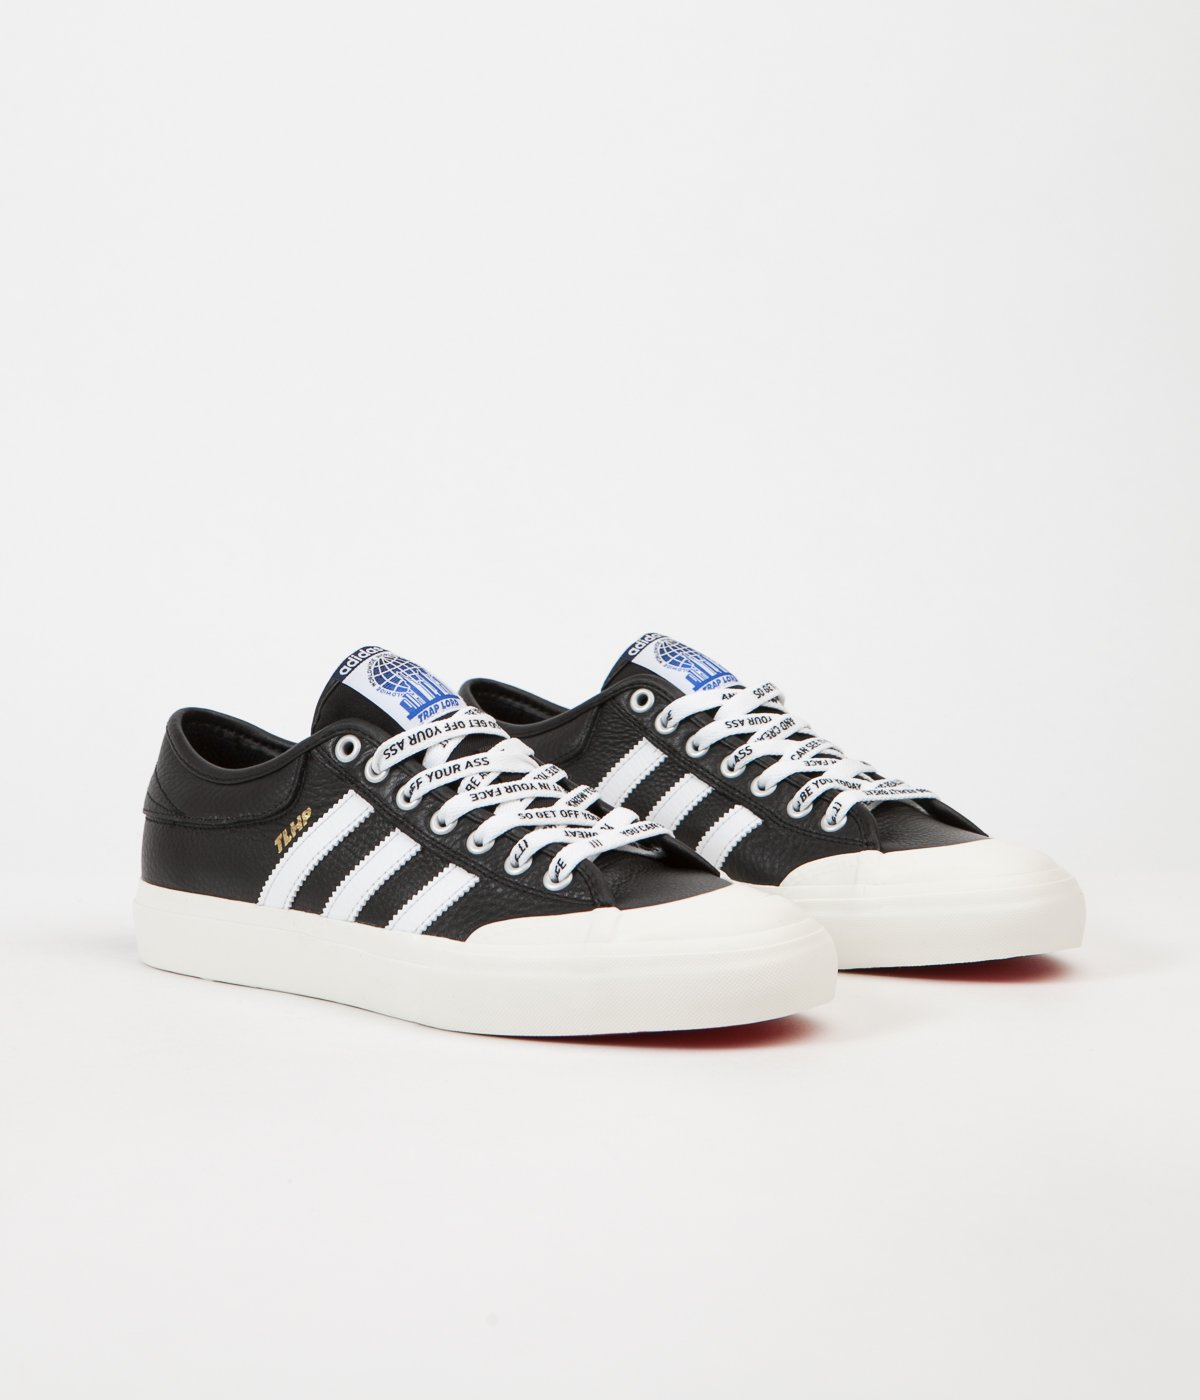 adidas x Trap Lord Matchcourt Black & White Shoes Zumiez  Adidas x Trap Lord Ferg Matchcourt Shoes